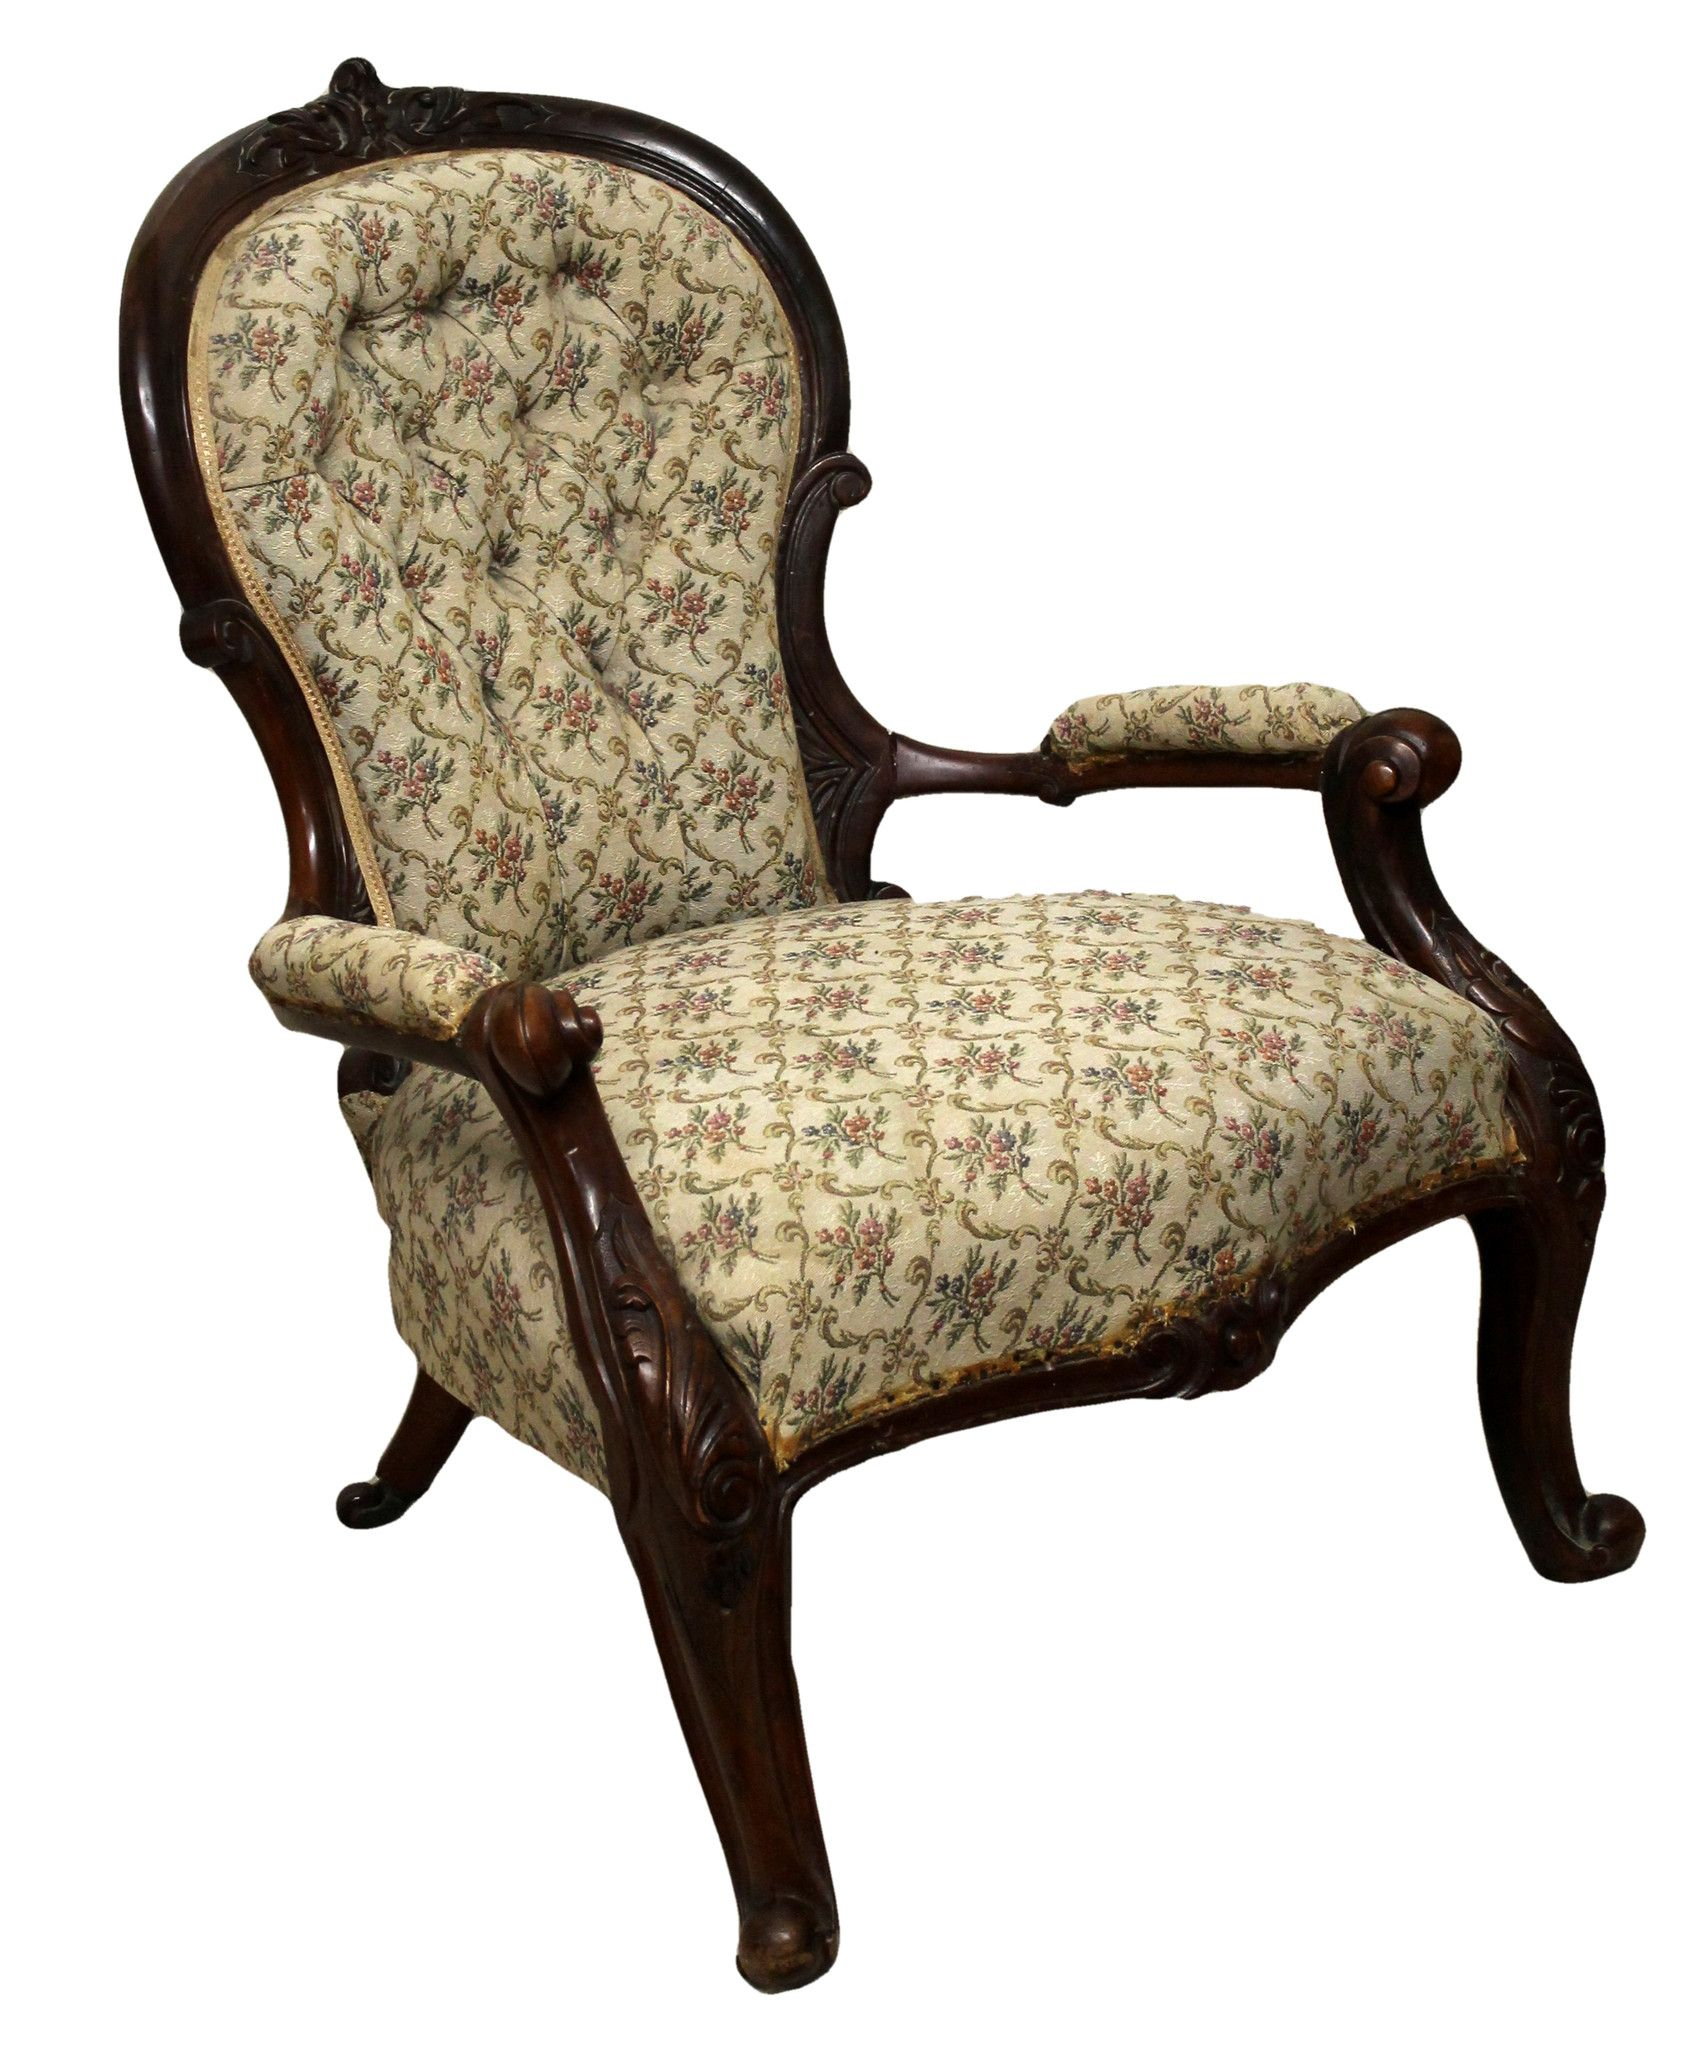 Astounding Victorian Antique Queen Anne Style Spoon Back Armchair Theyellowbook Wood Chair Design Ideas Theyellowbookinfo